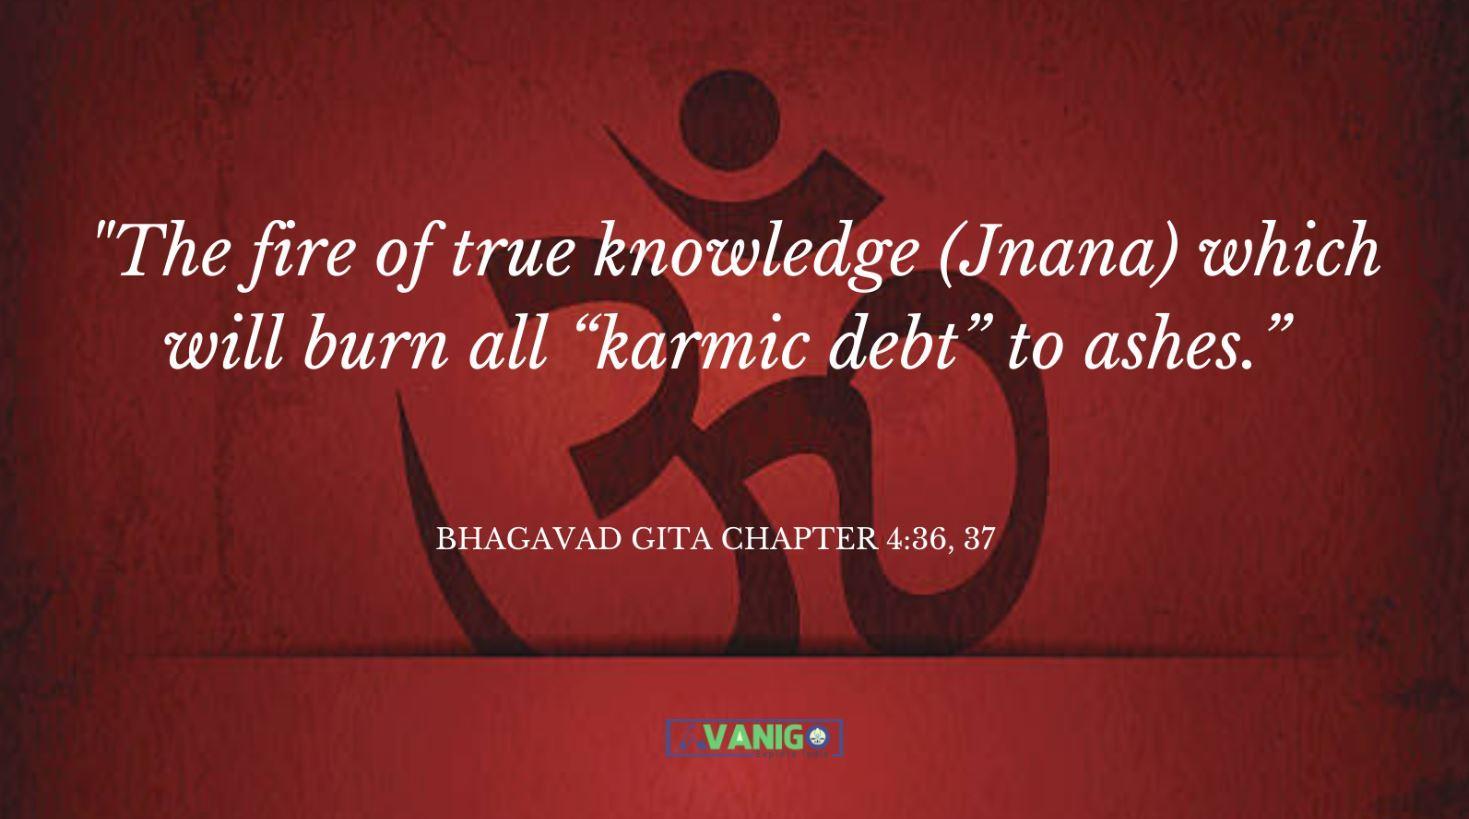 Bhagvad Gita Chapter 4:36, 37